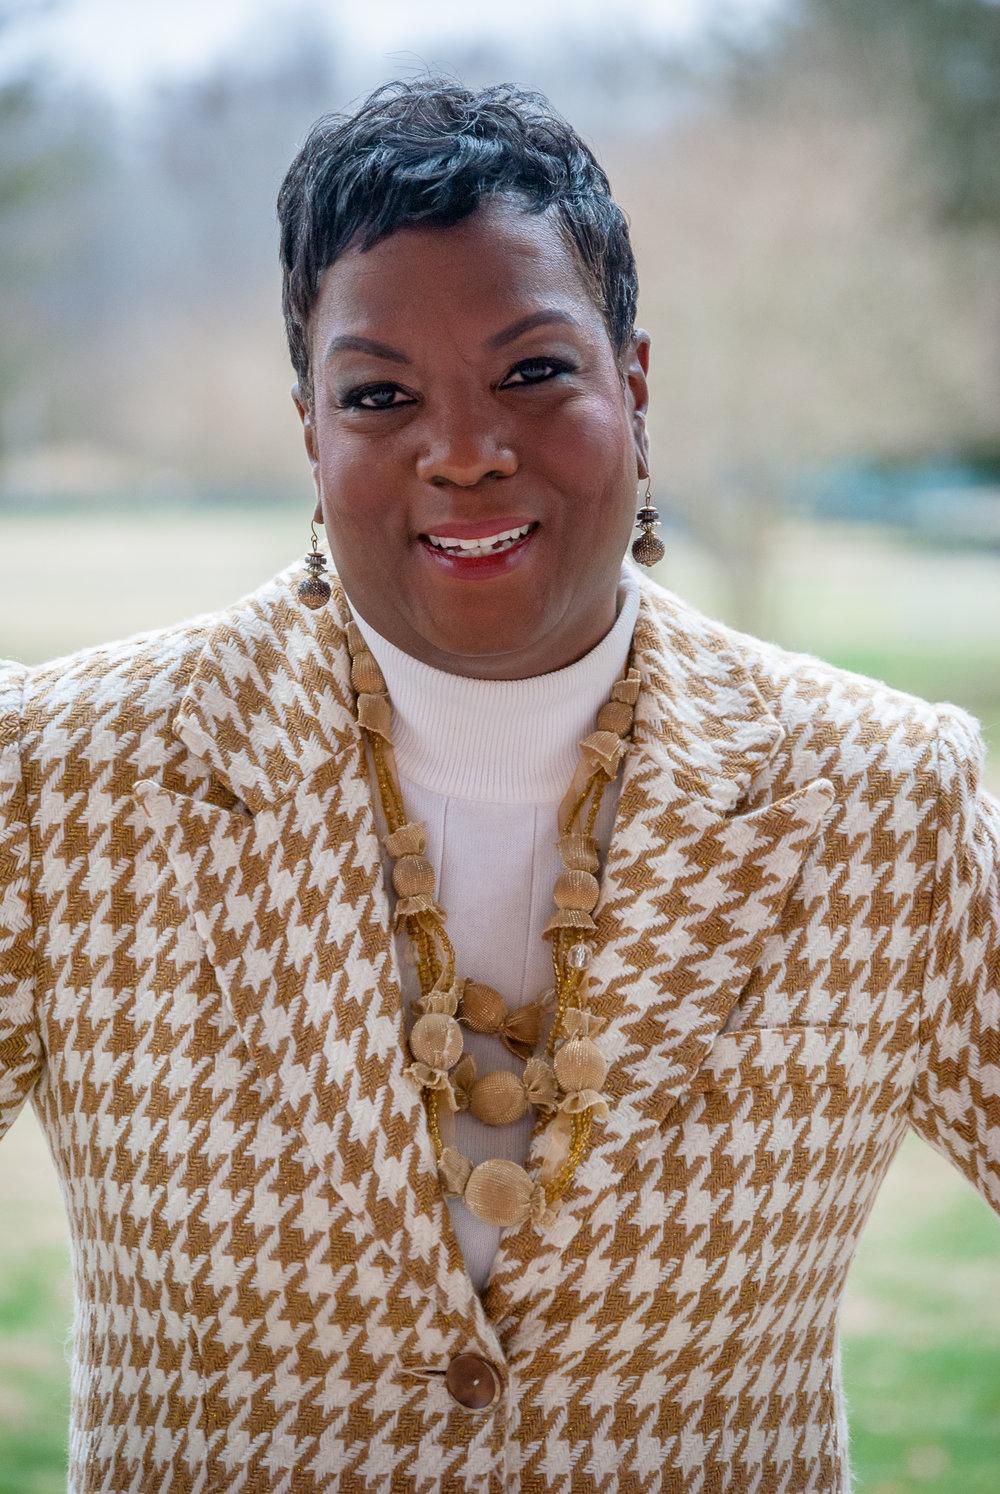 Meet Dr. Charlene Winley - Speaker, Life Strategist & Transformation Specialist